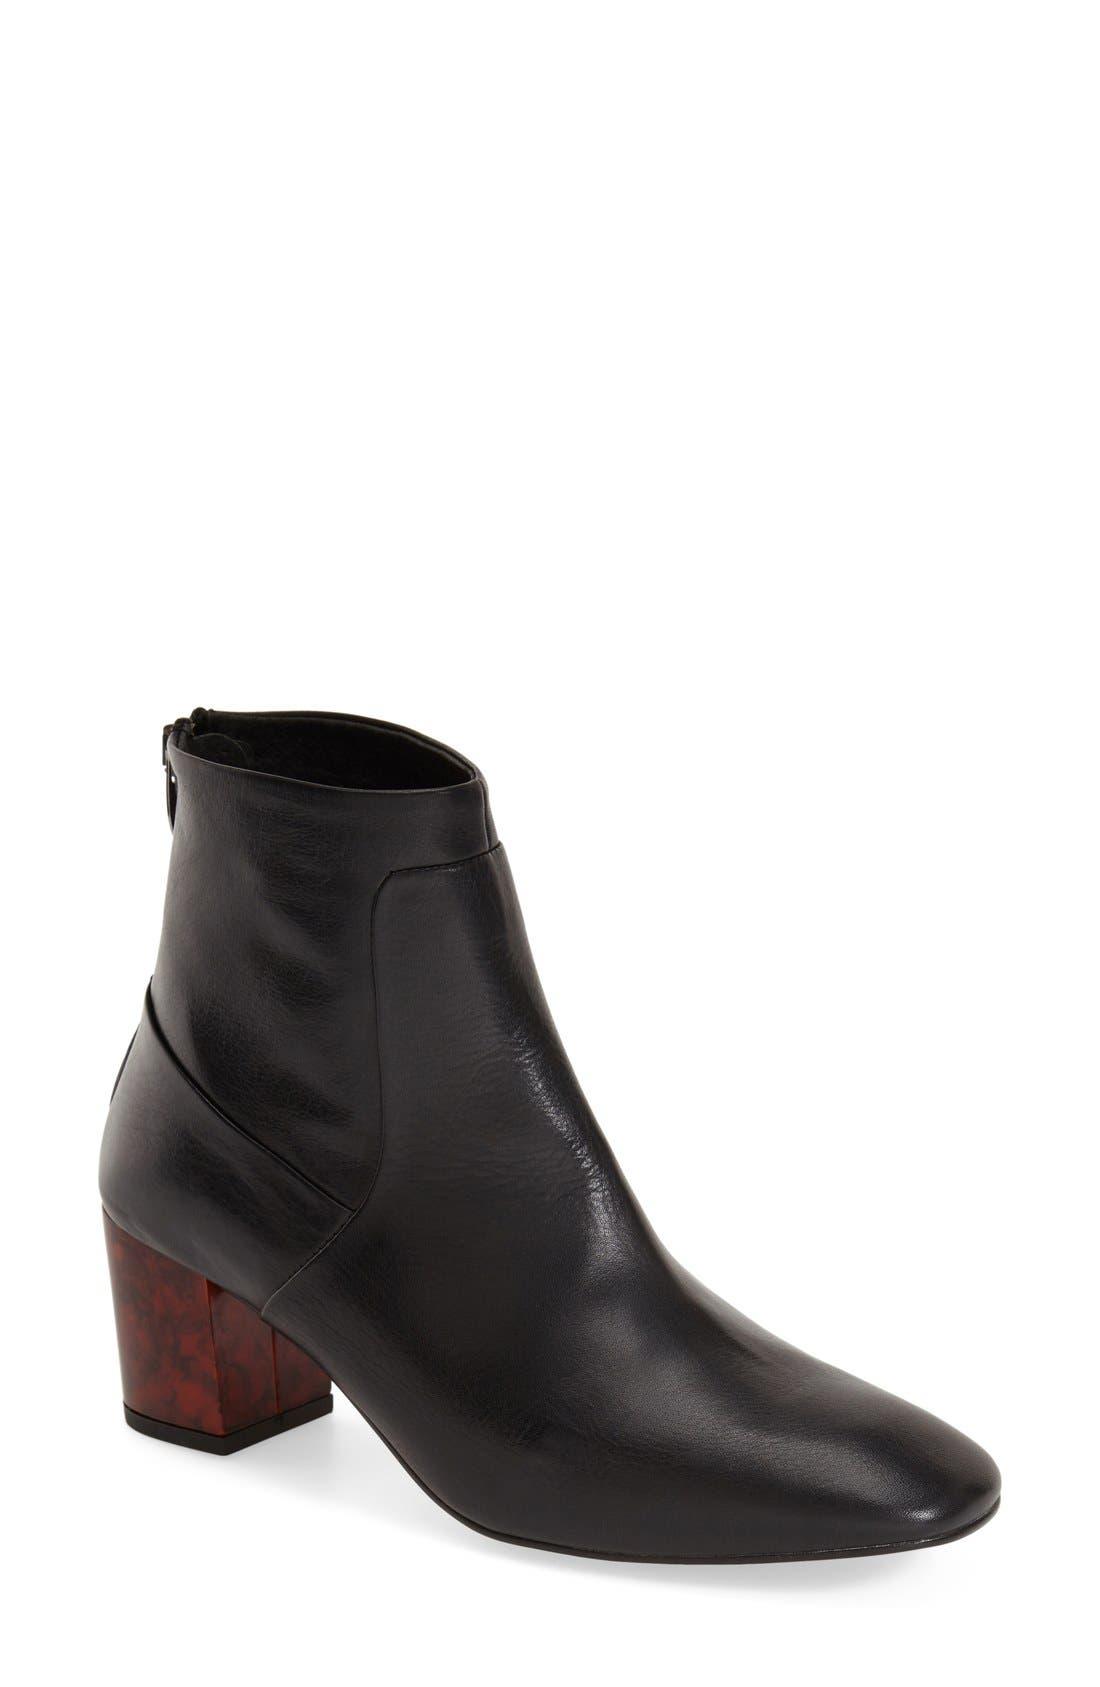 Alternate Image 1 Selected - Topshop 'Mistic'  Boot (Women)